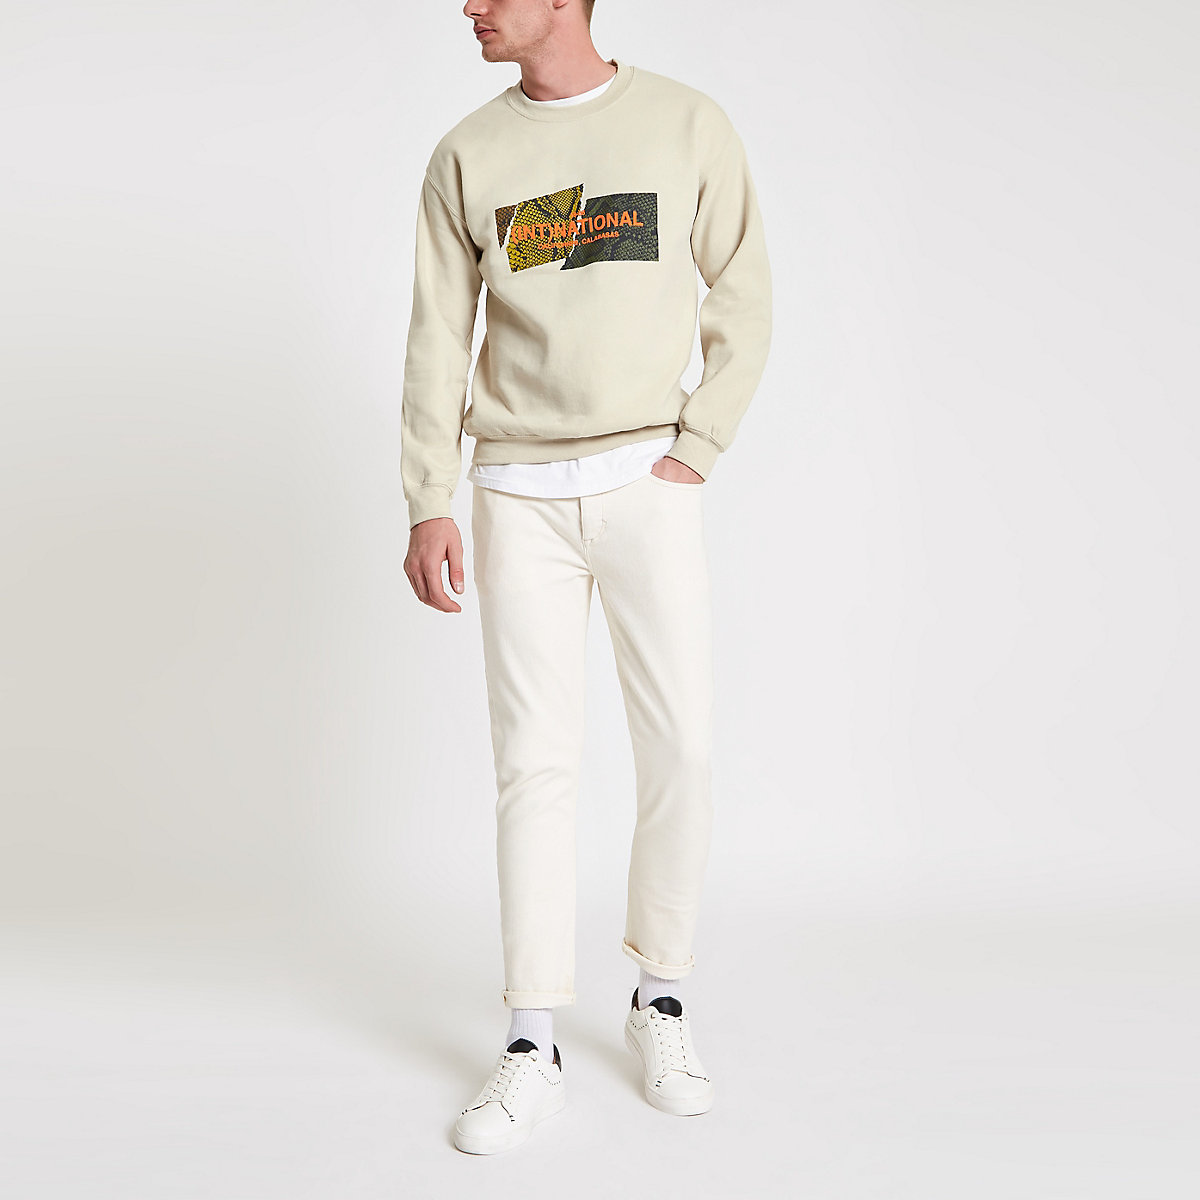 Stone 'international' crew neck sweatshirt